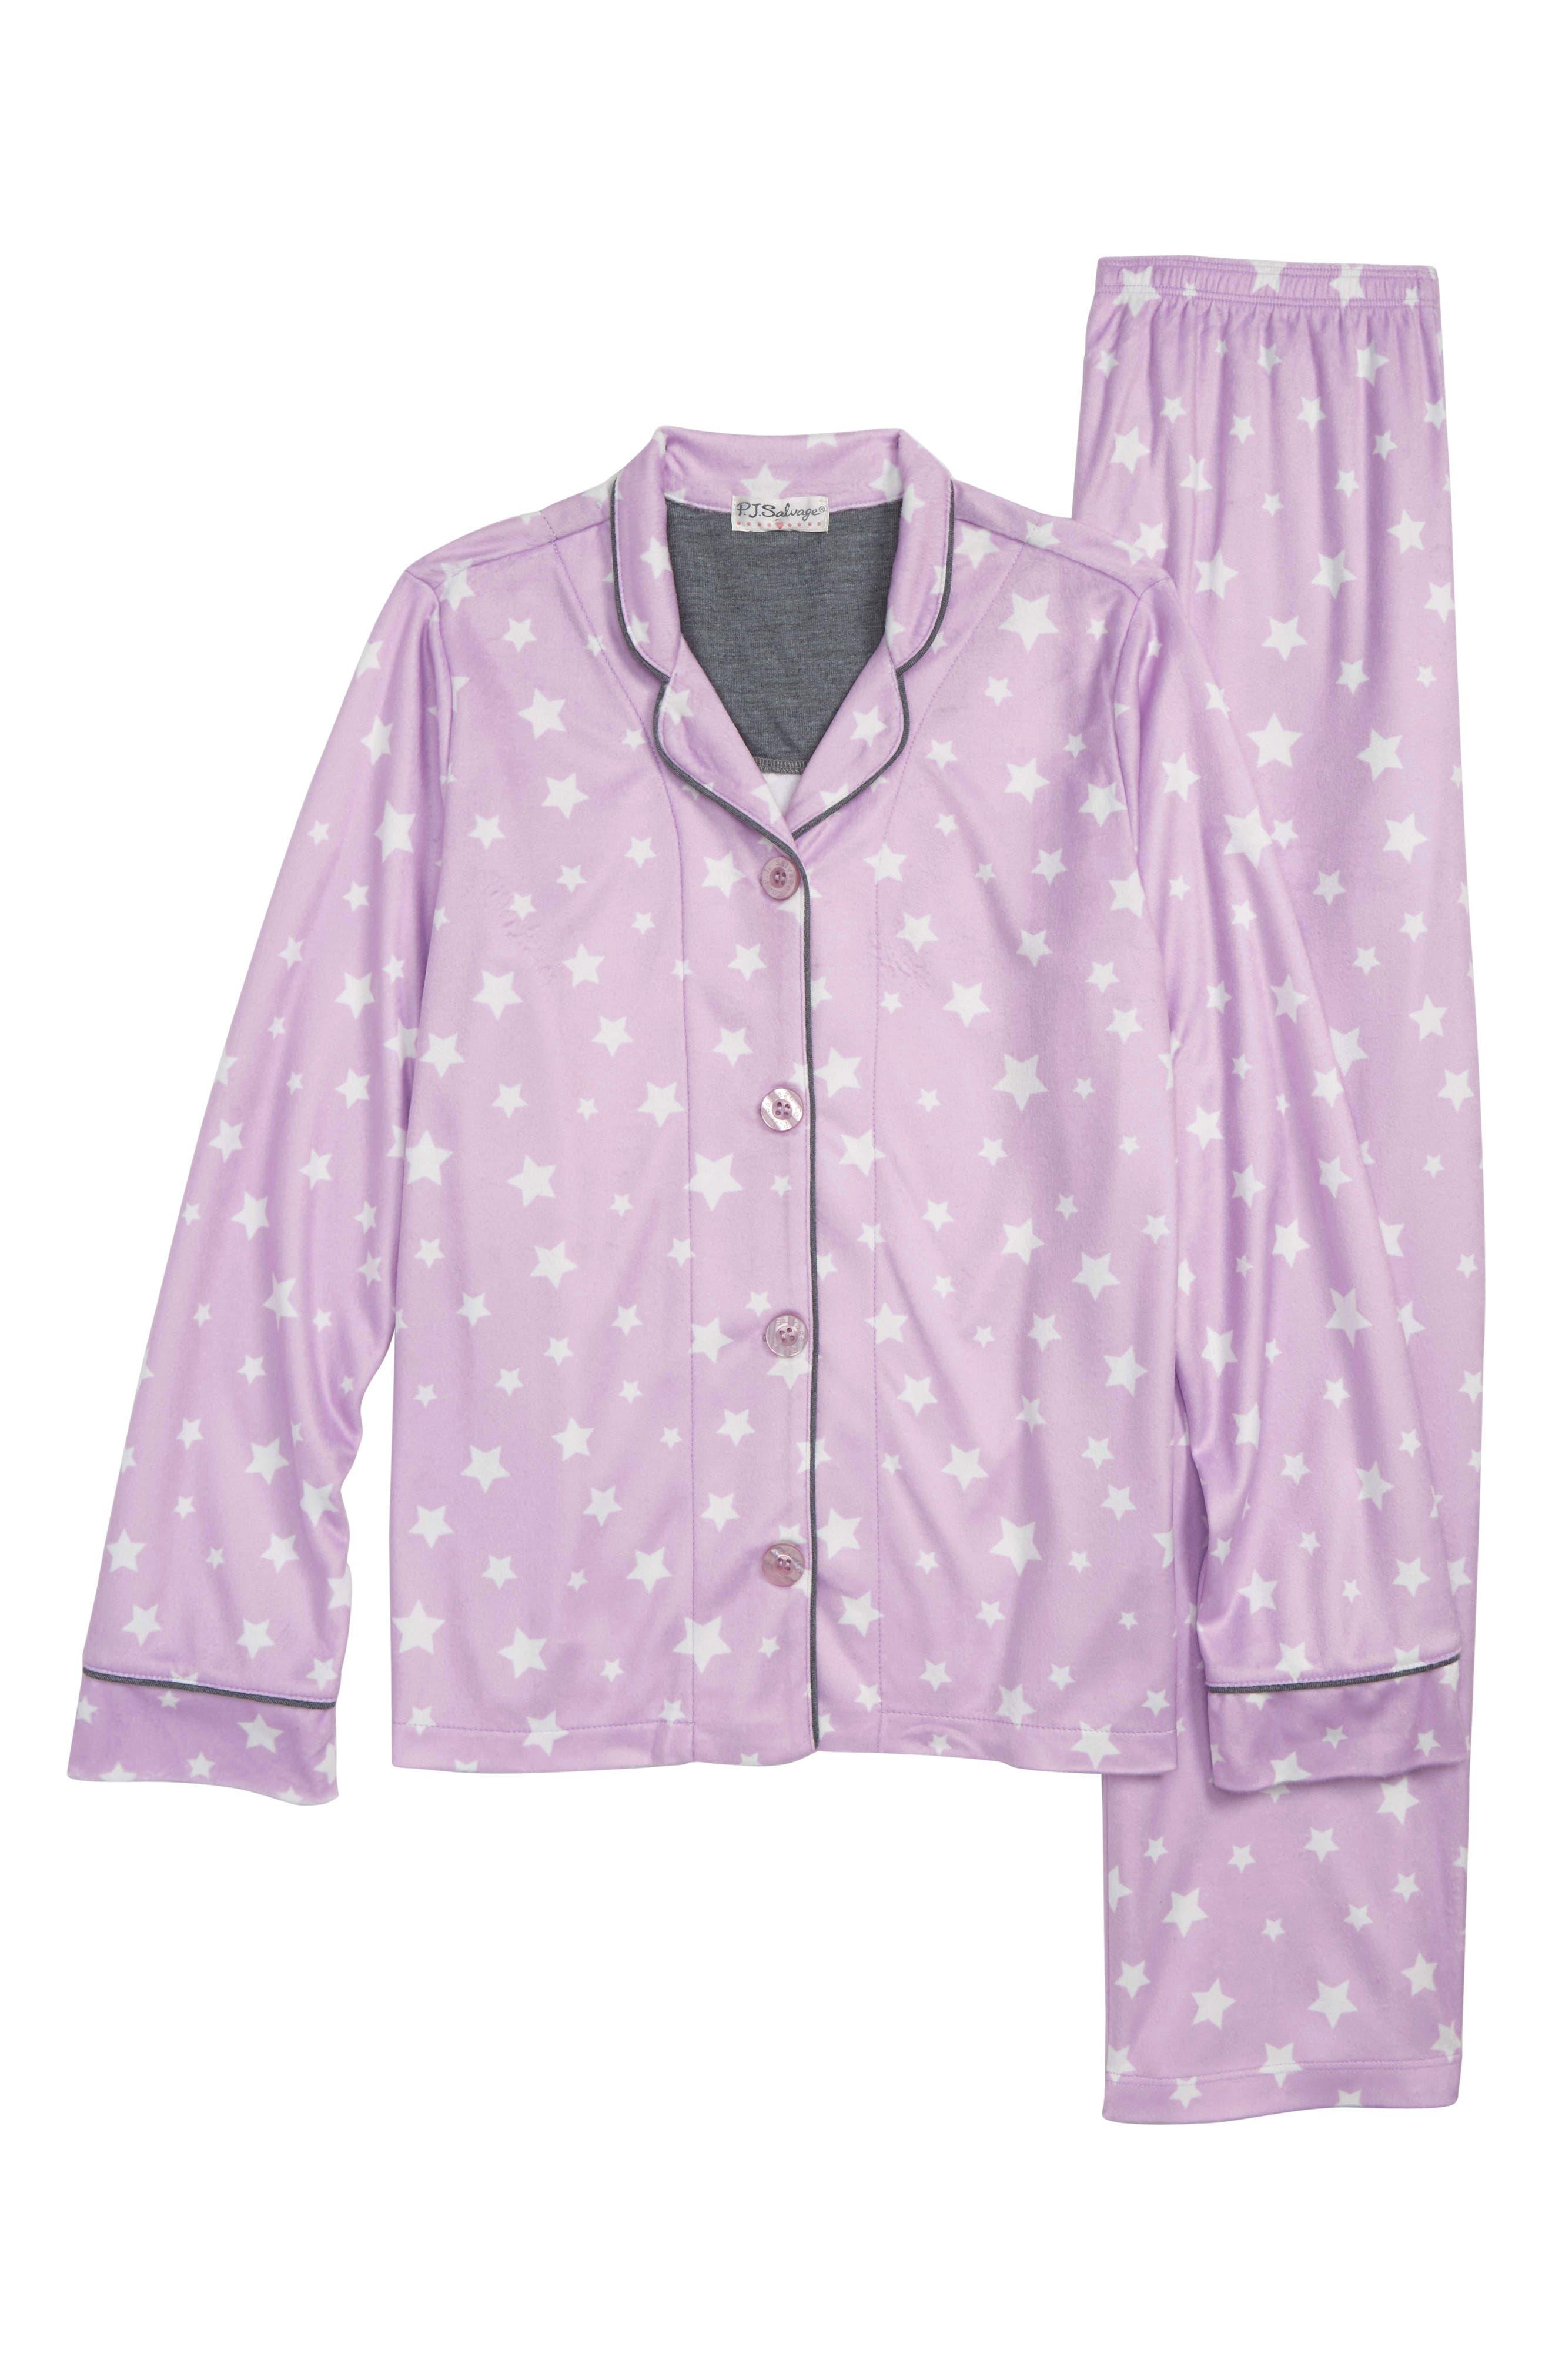 Girls Pj Salvage Written In The Stars TwoPiece Pajamas